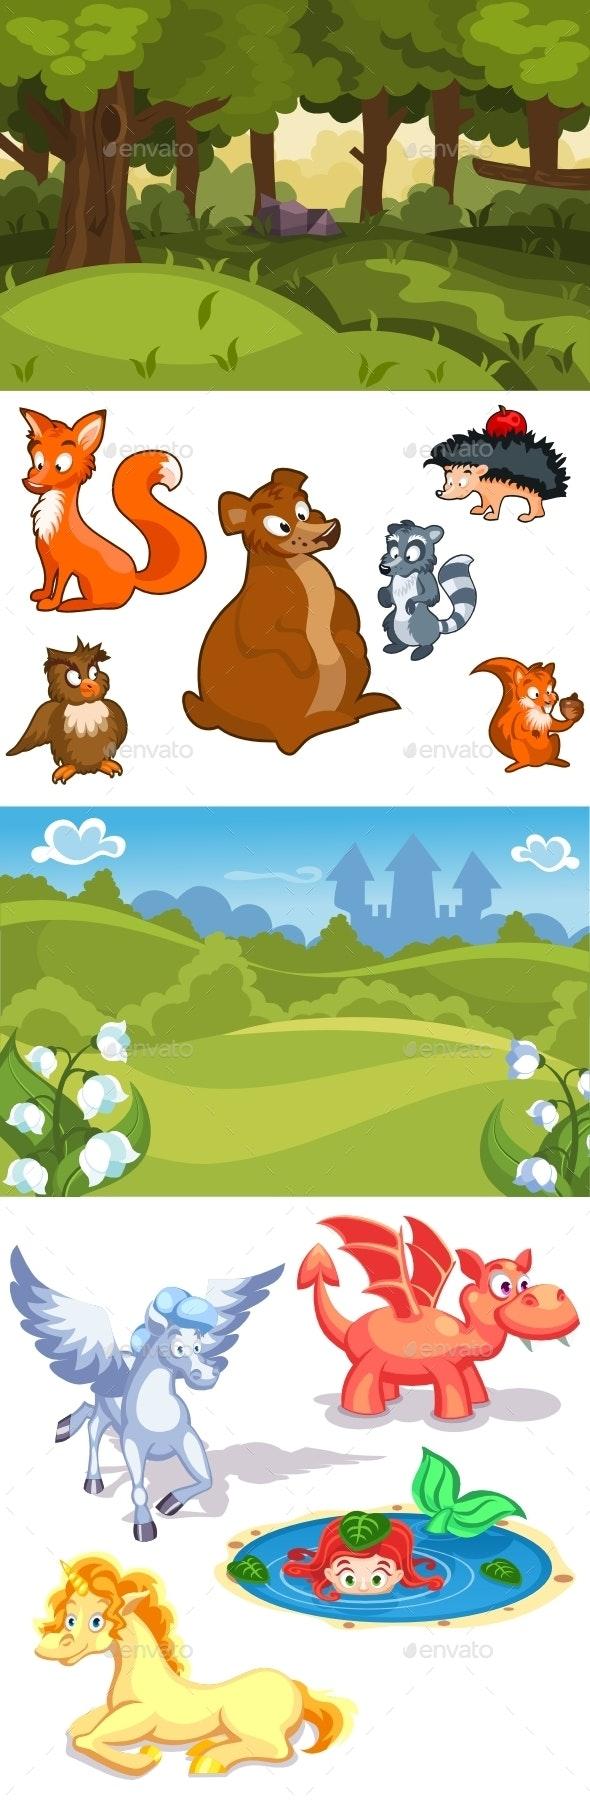 Cartoon Animals Pack-1 - Animals Characters